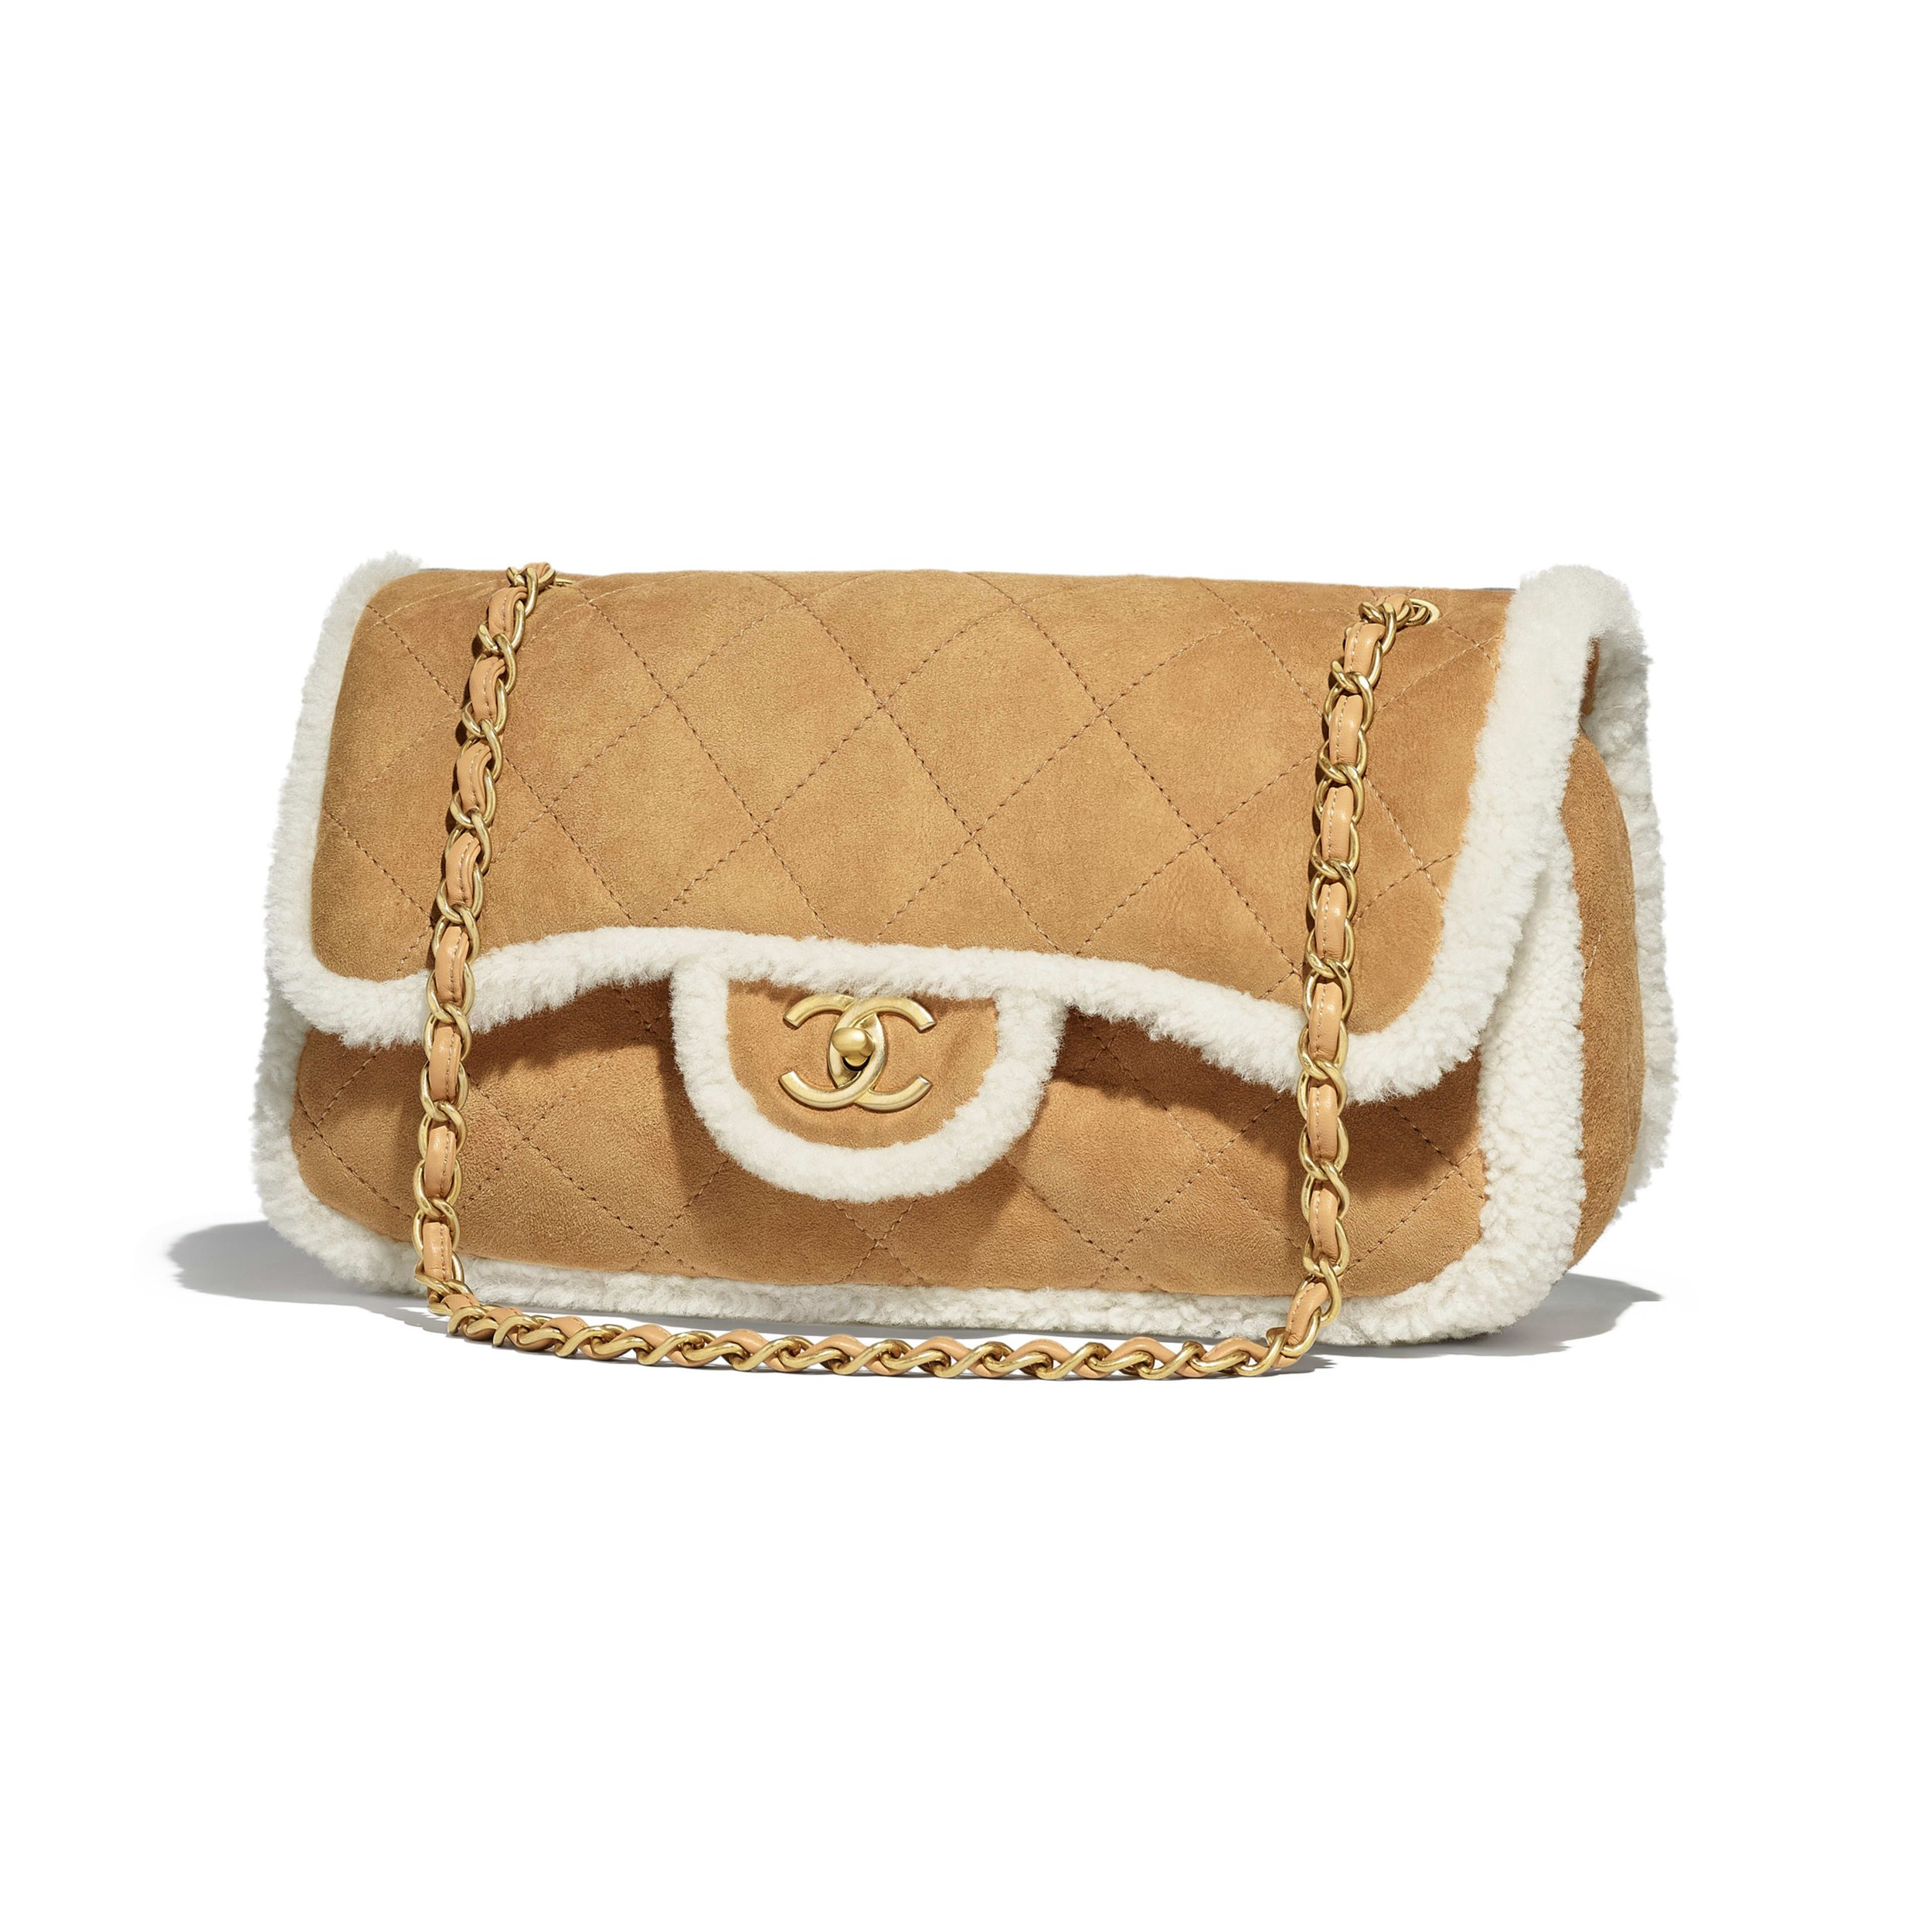 Shearling Chanel bag -